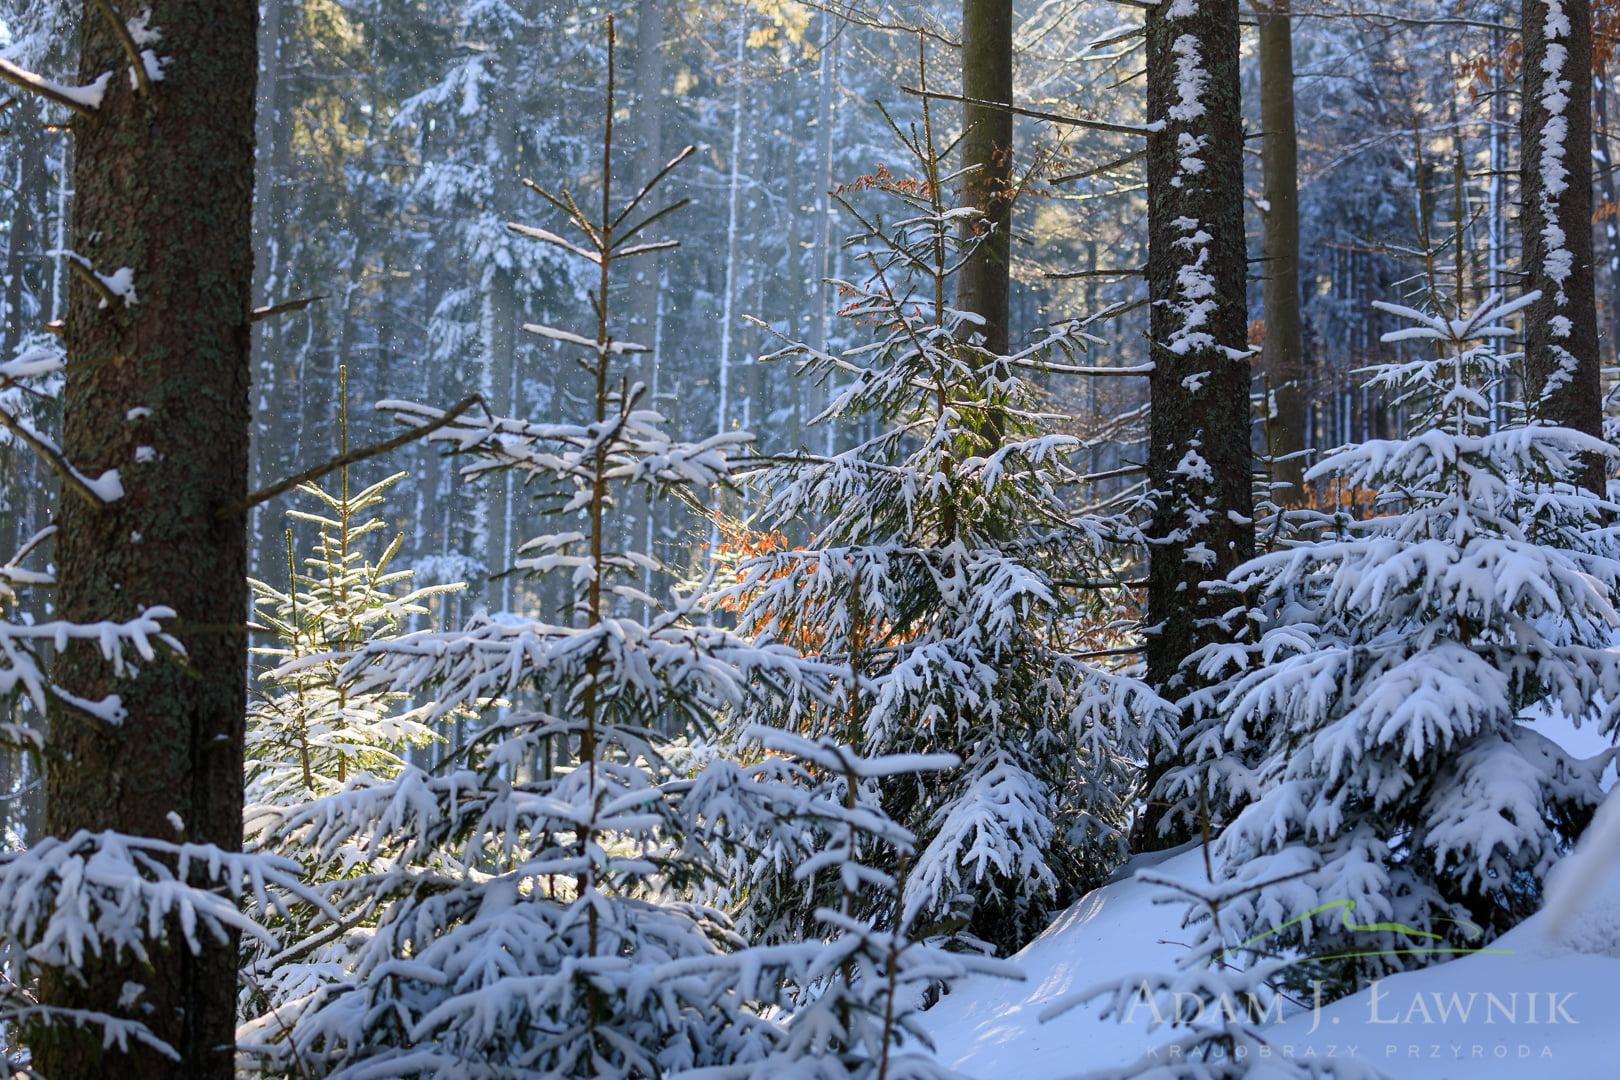 Babia Góra National Park, Poland 1702-00208C